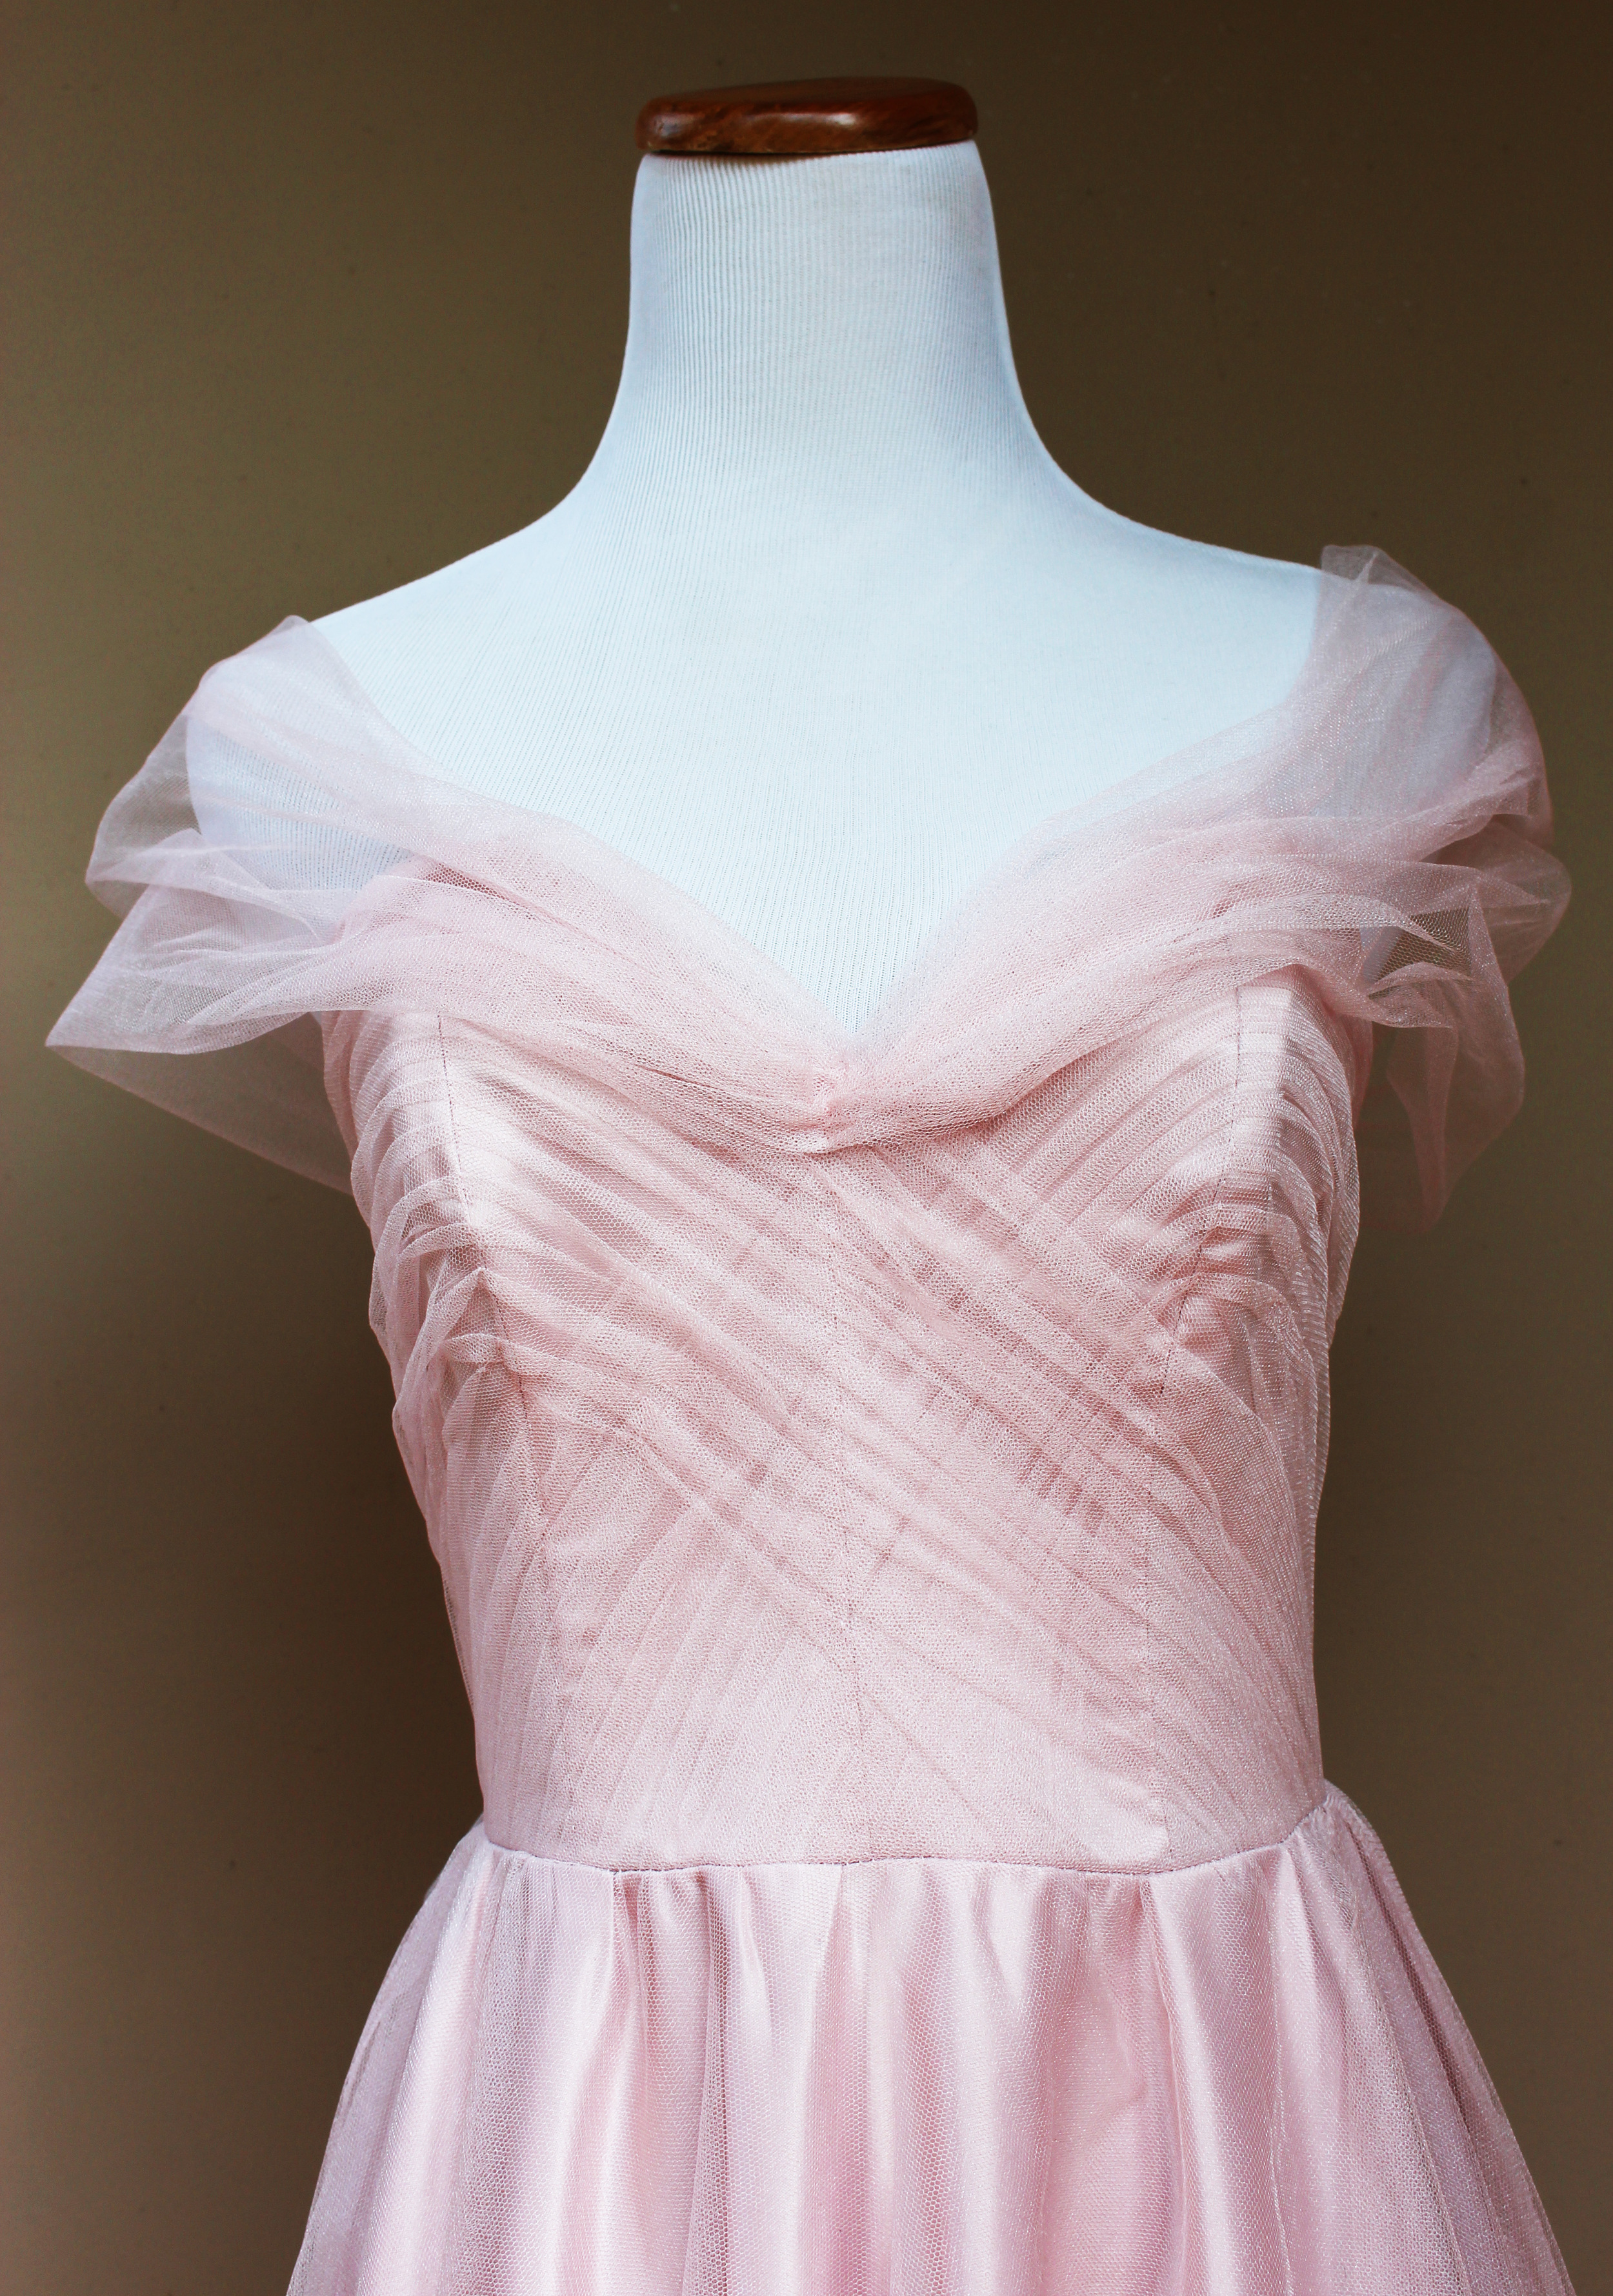 Evening Gown Detail.jpg